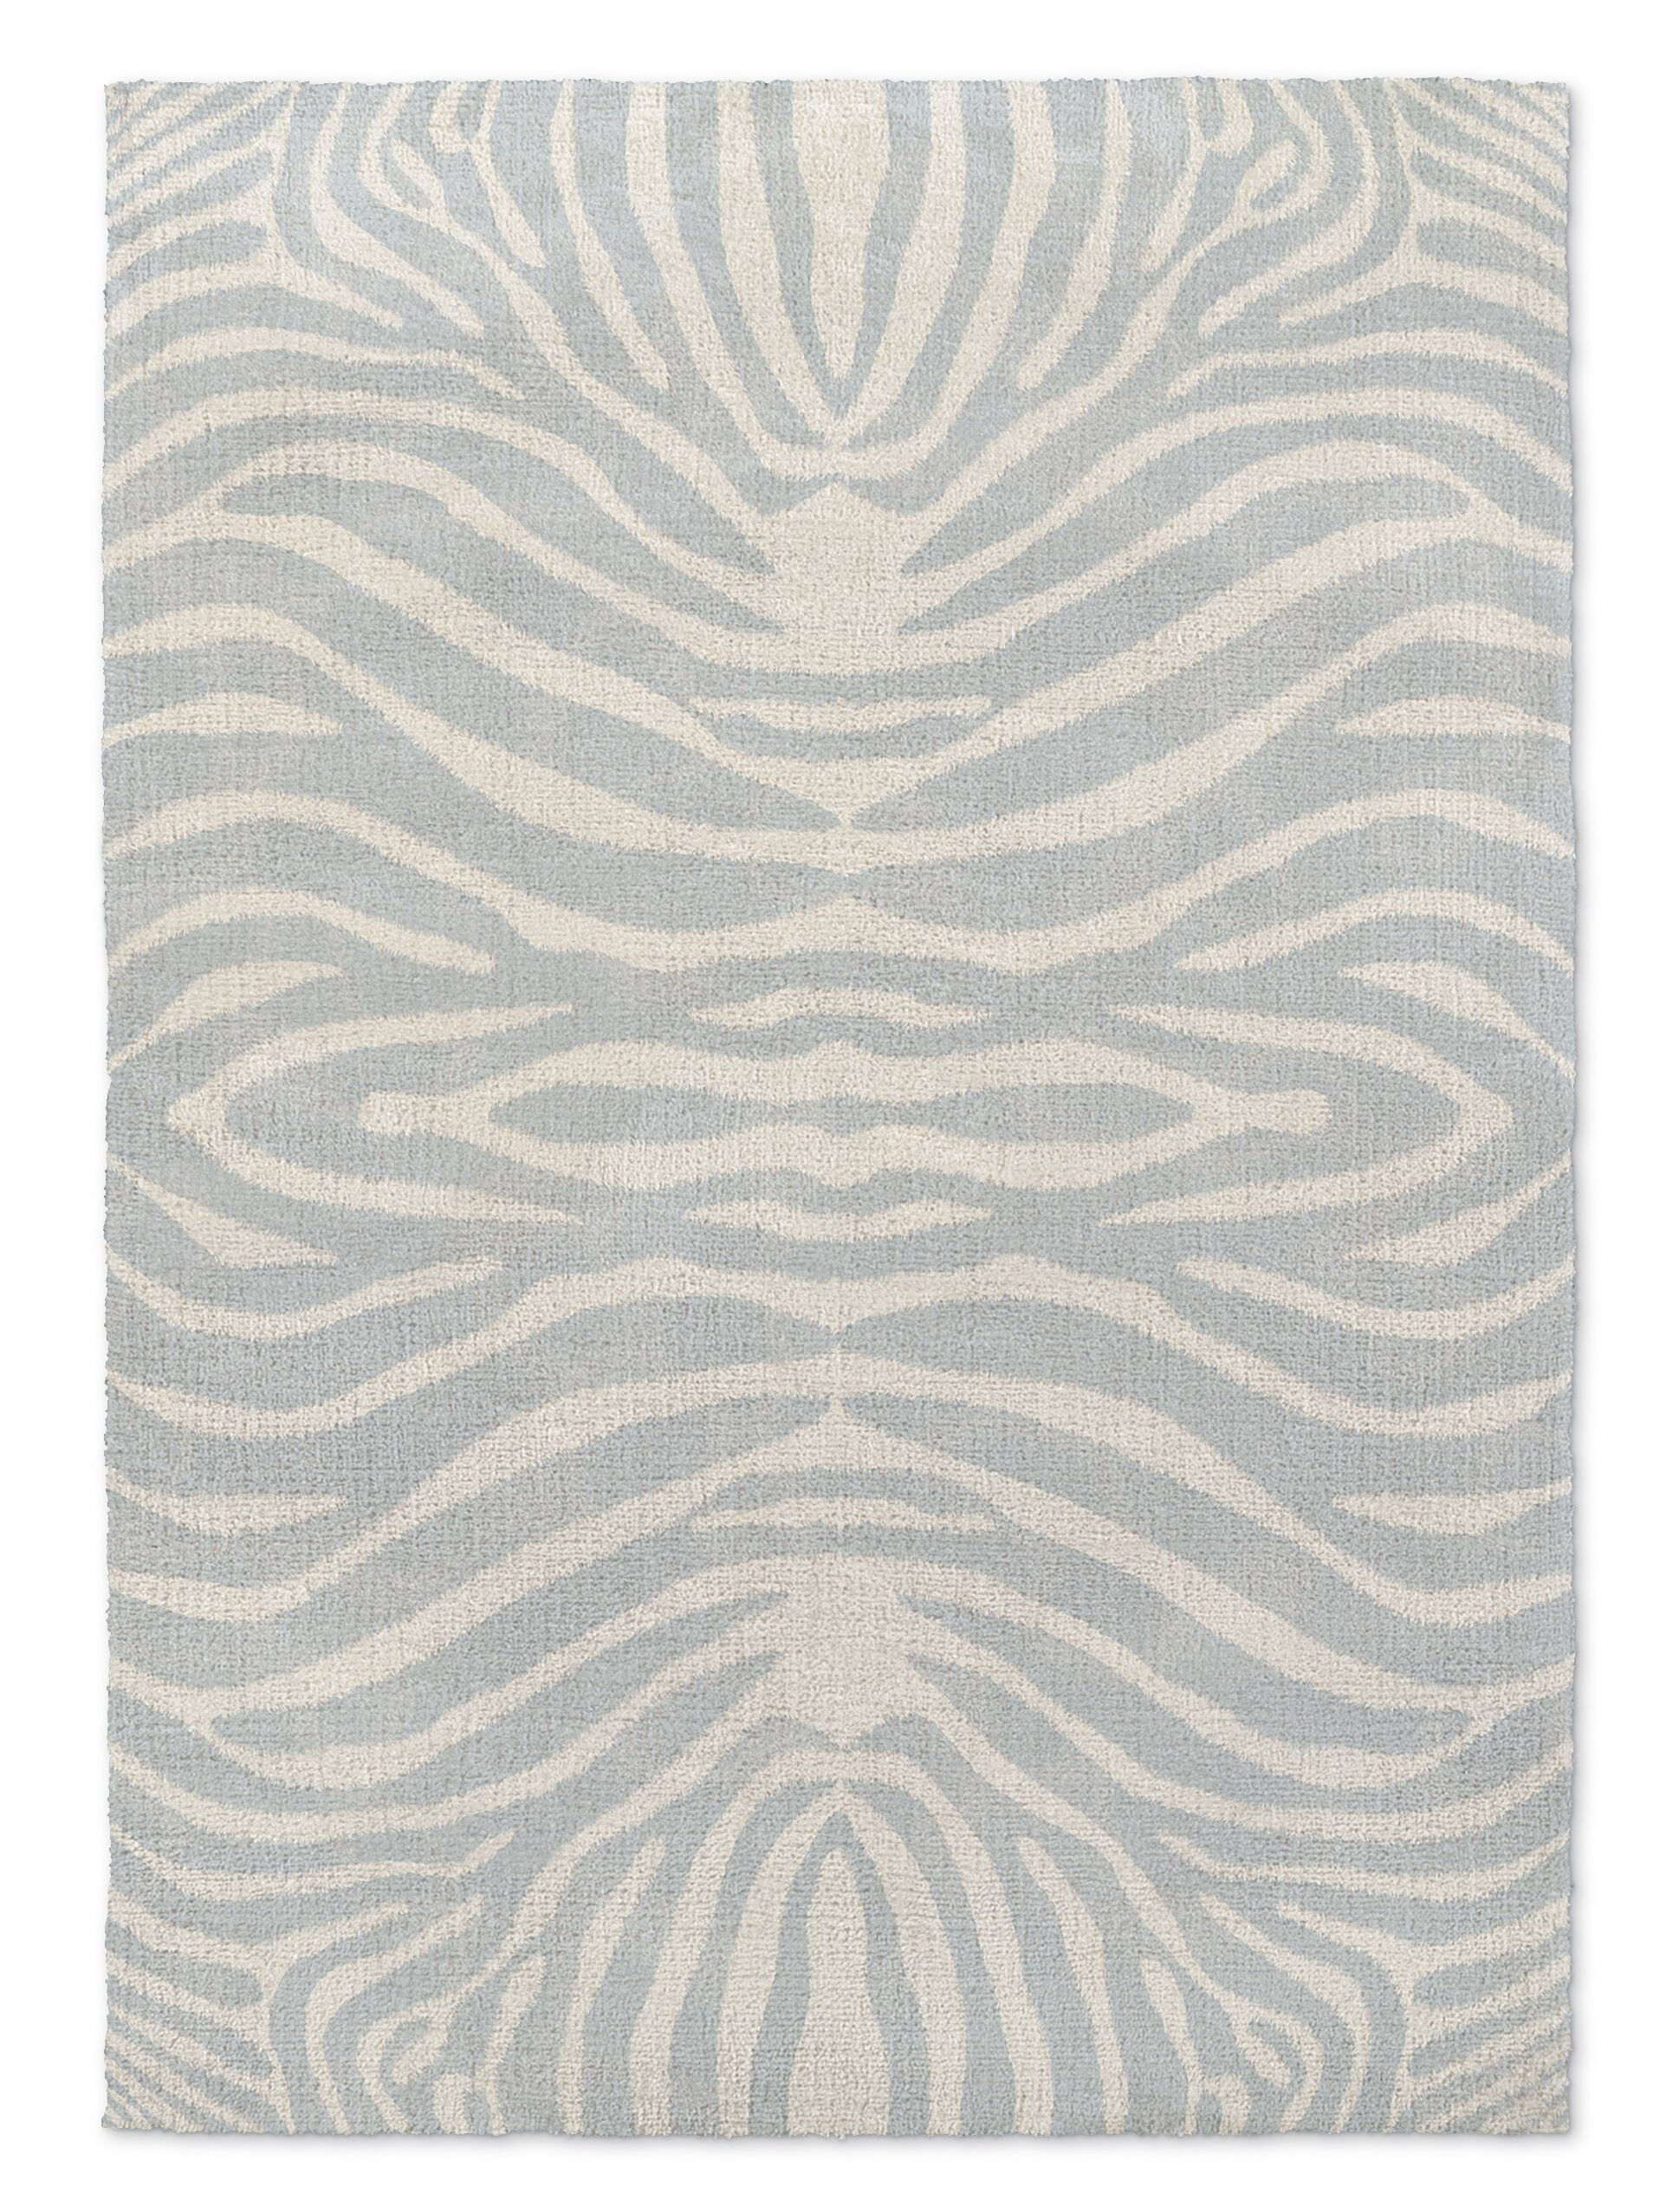 Nerbone Gray/Beige Area Rug Rug Size: Rectangle 8' x 10'